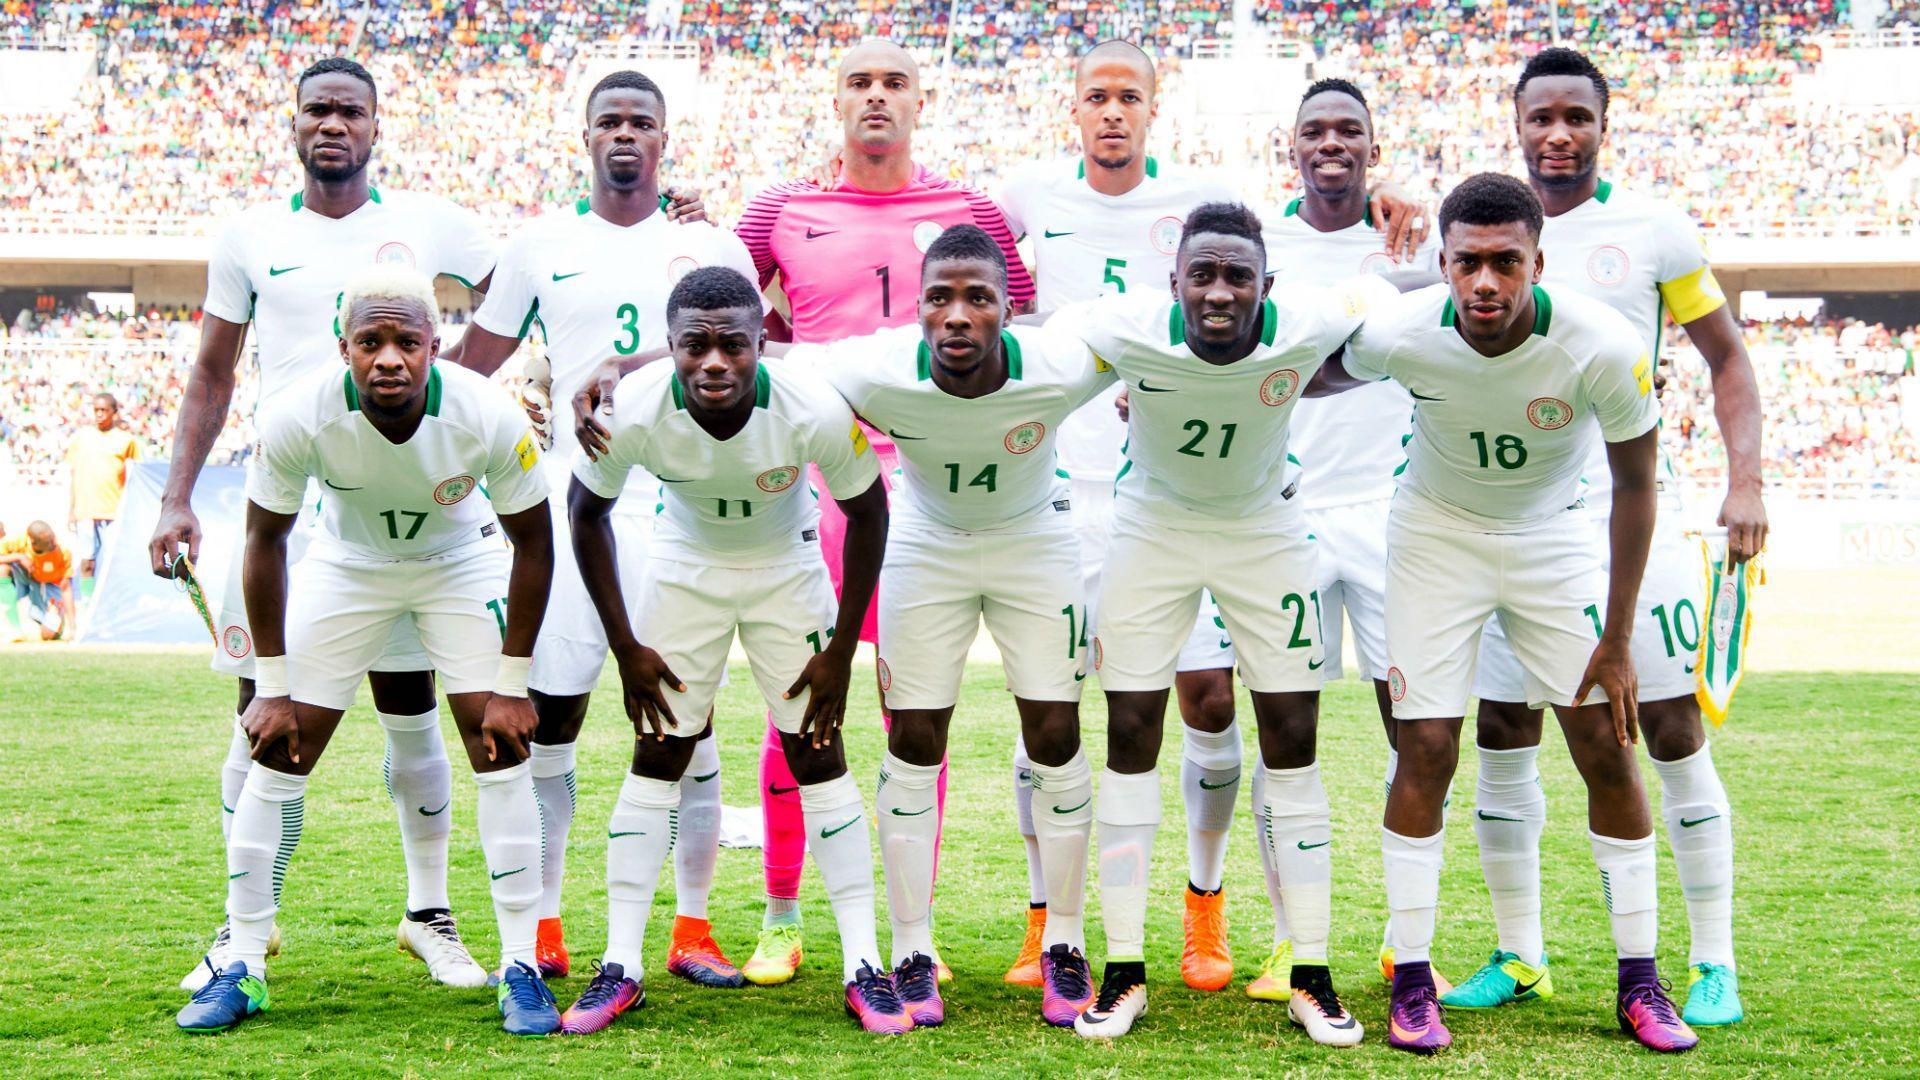 Nigeria National Football Team Teams Backgrounds 5